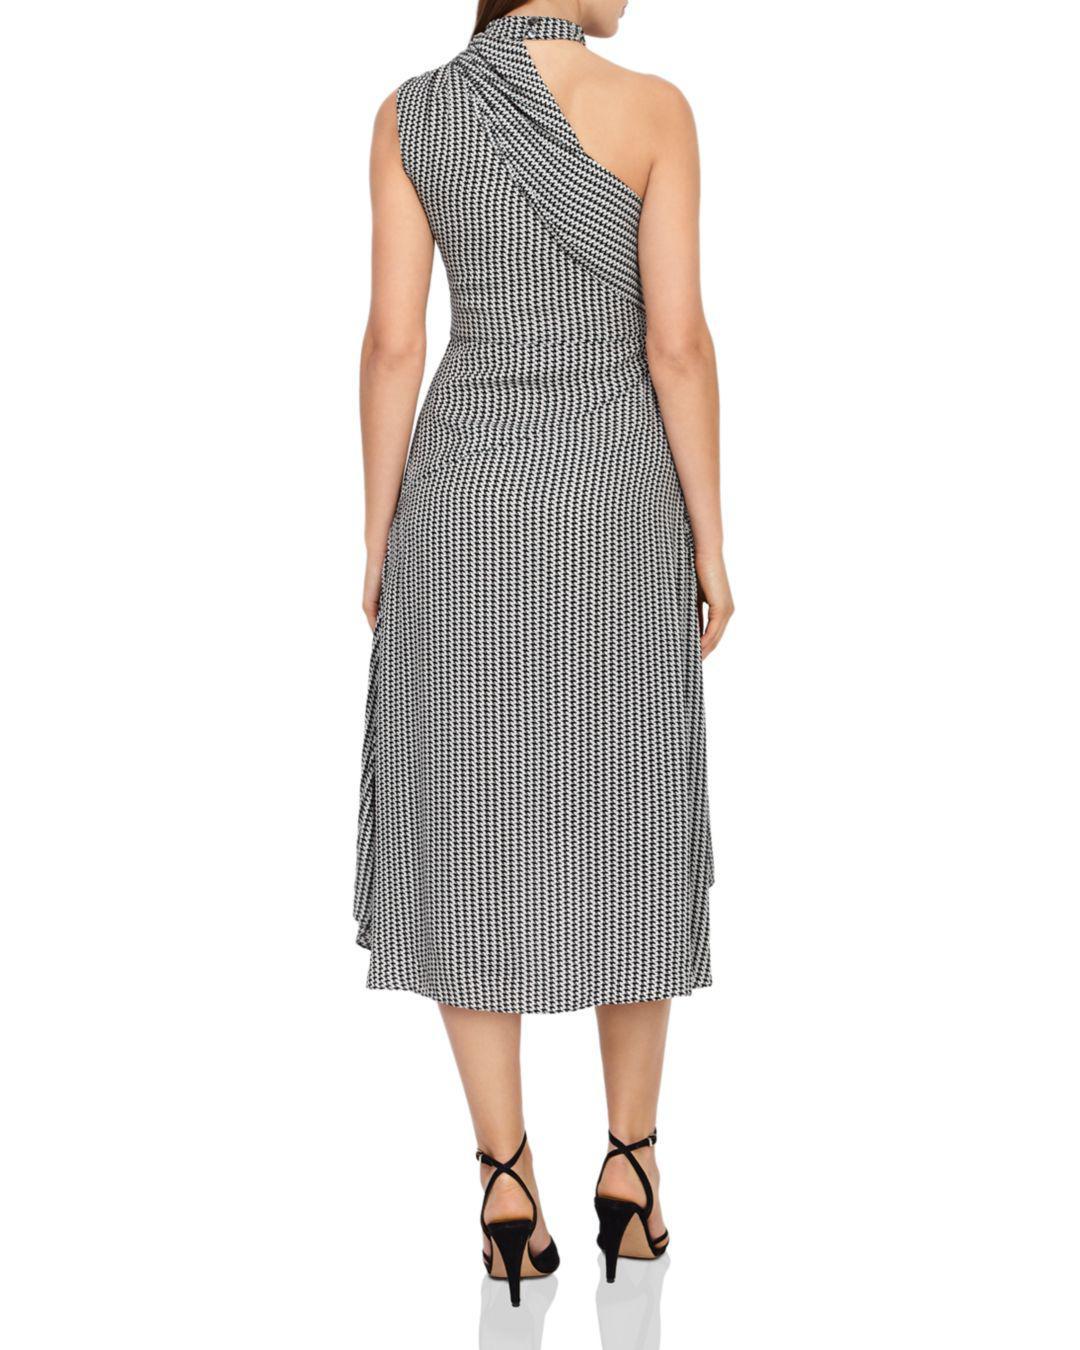 5e41c775e6 Lyst - Reiss Adelia Asymmetric Houndstooth Dress in Gray